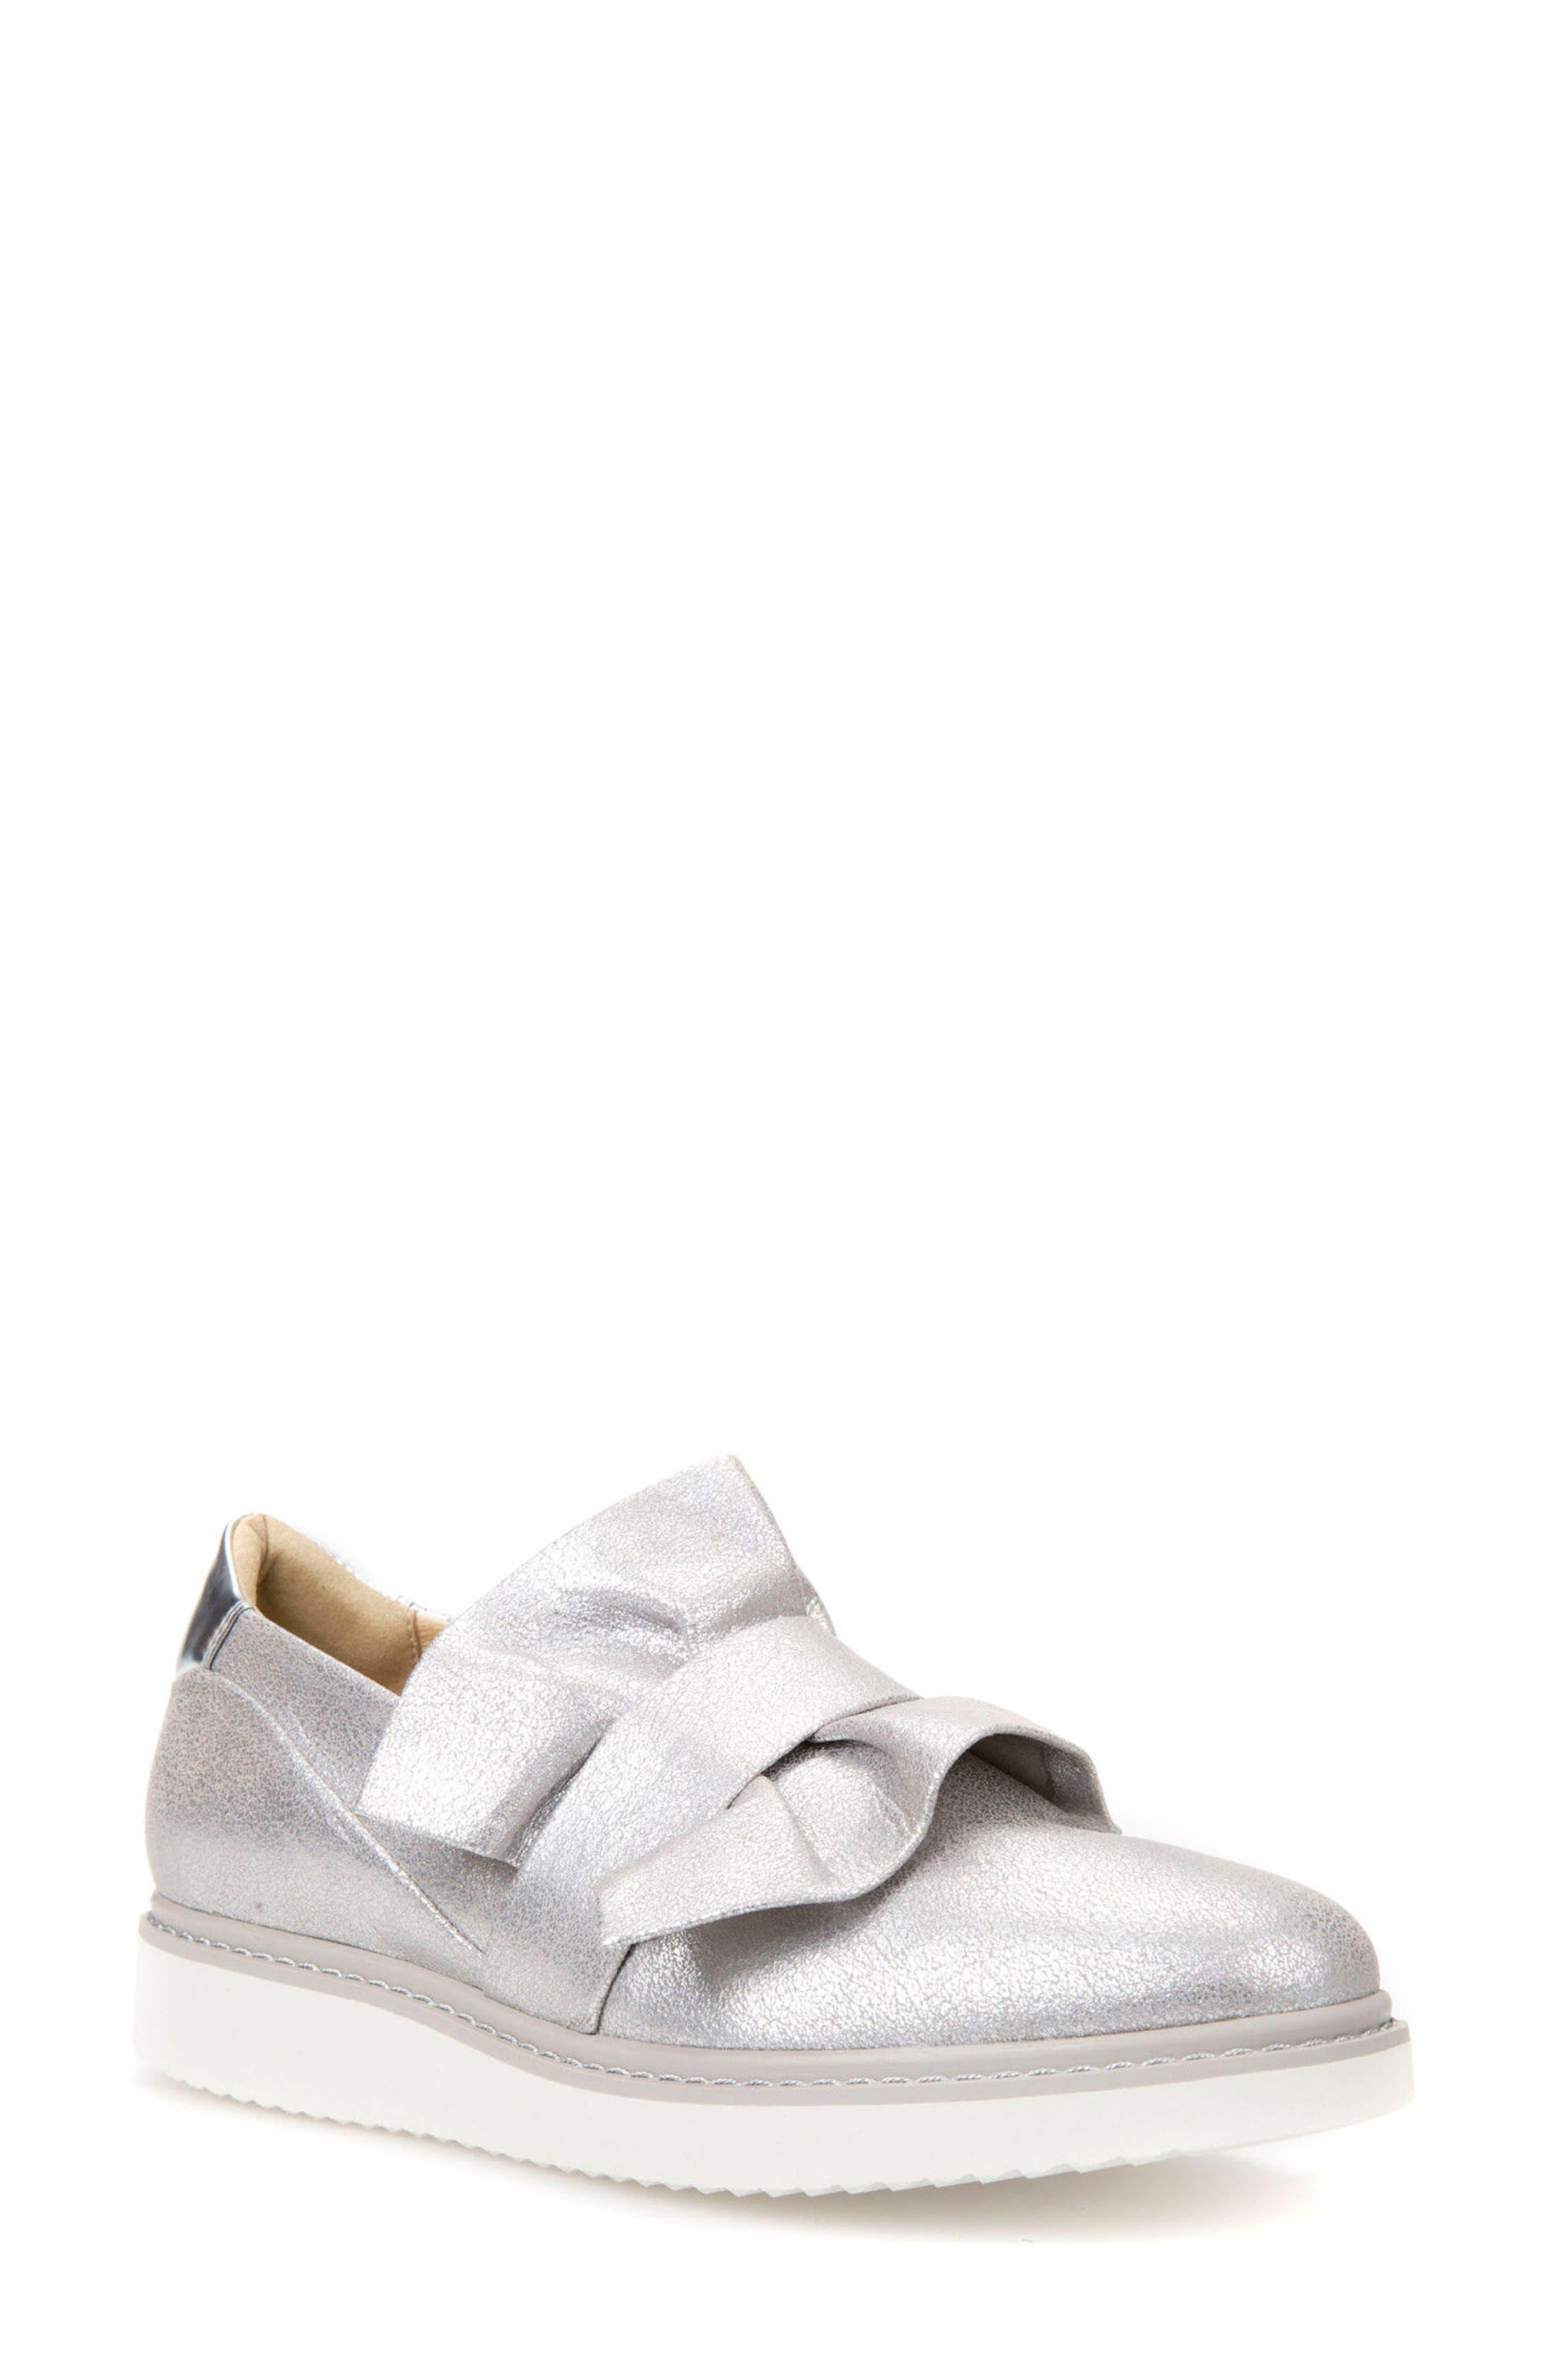 Thymar 15 Slip-On Sneaker,                             Main thumbnail 1, color,                             Silver Fabric